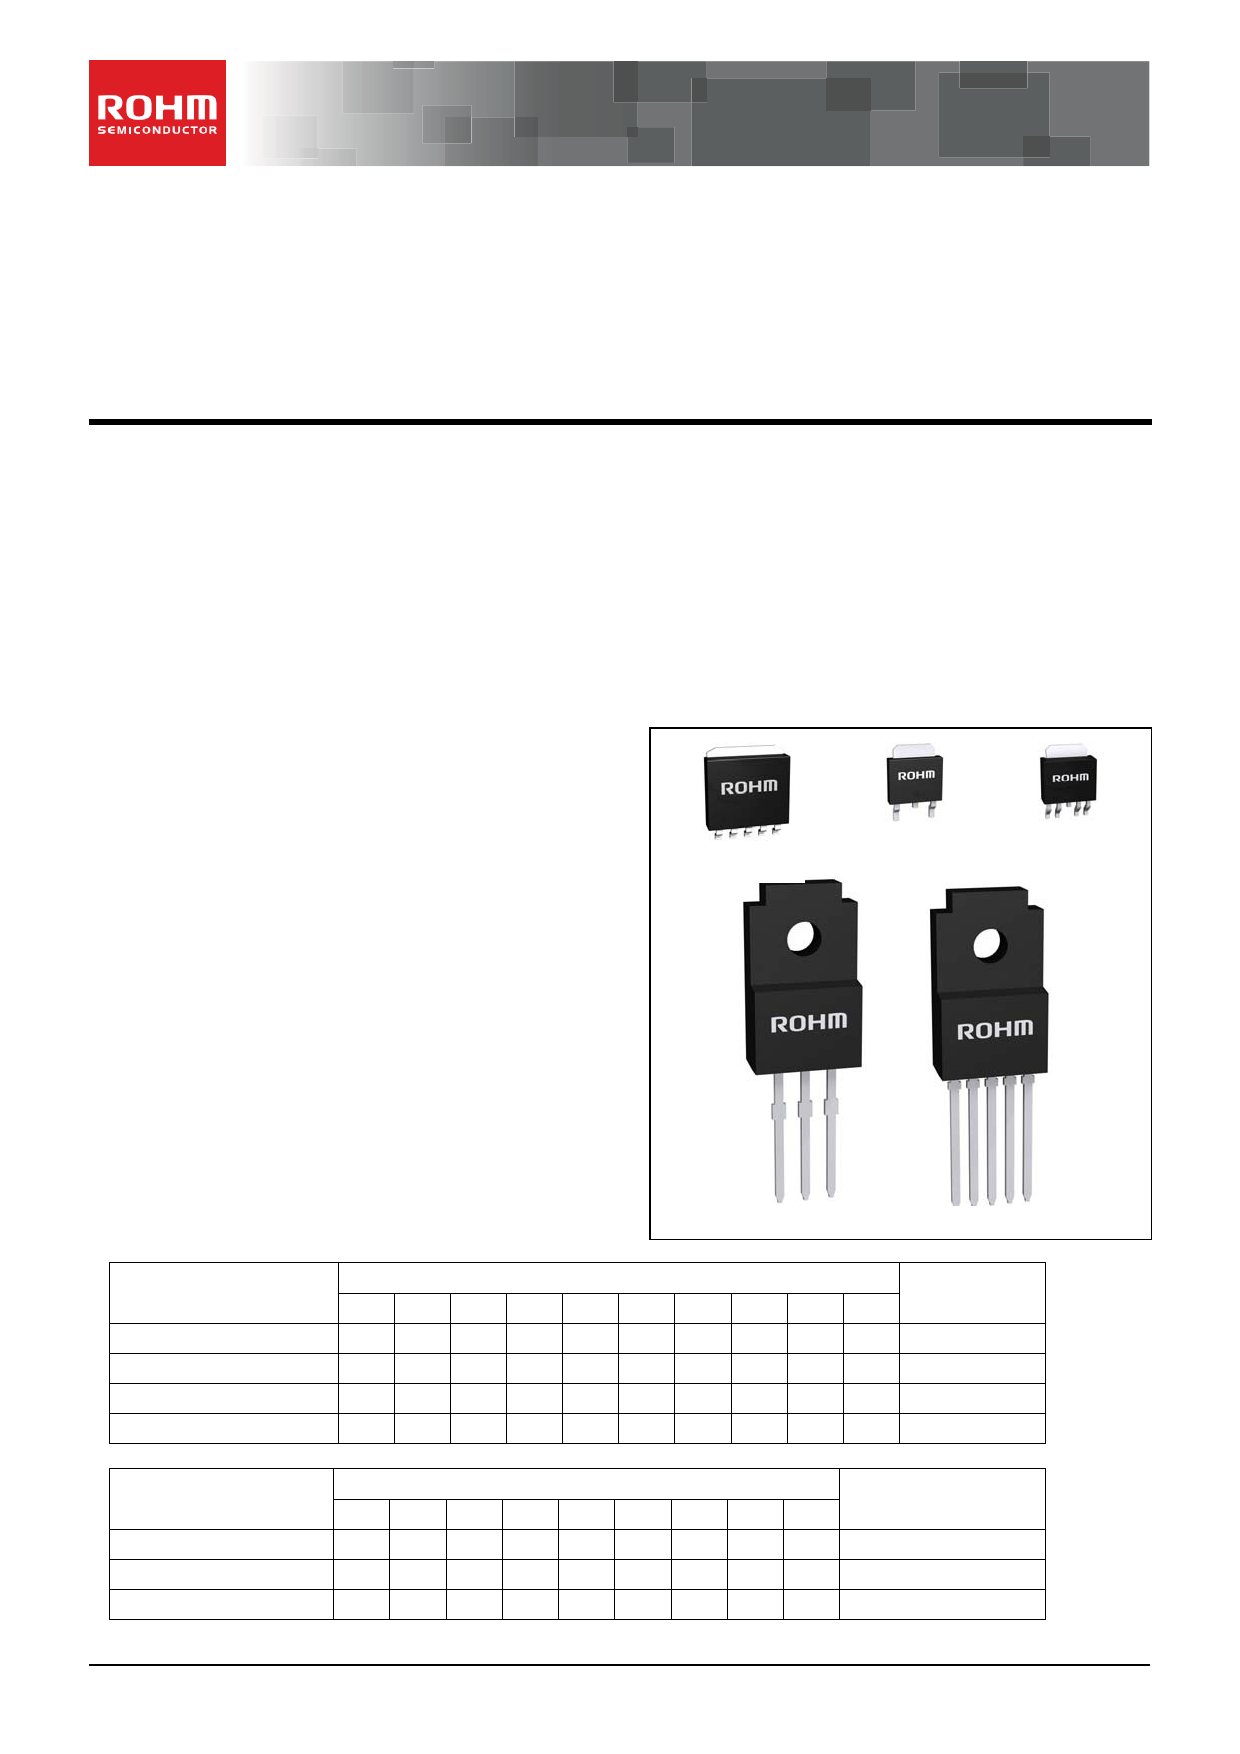 BA07CC0T datasheet